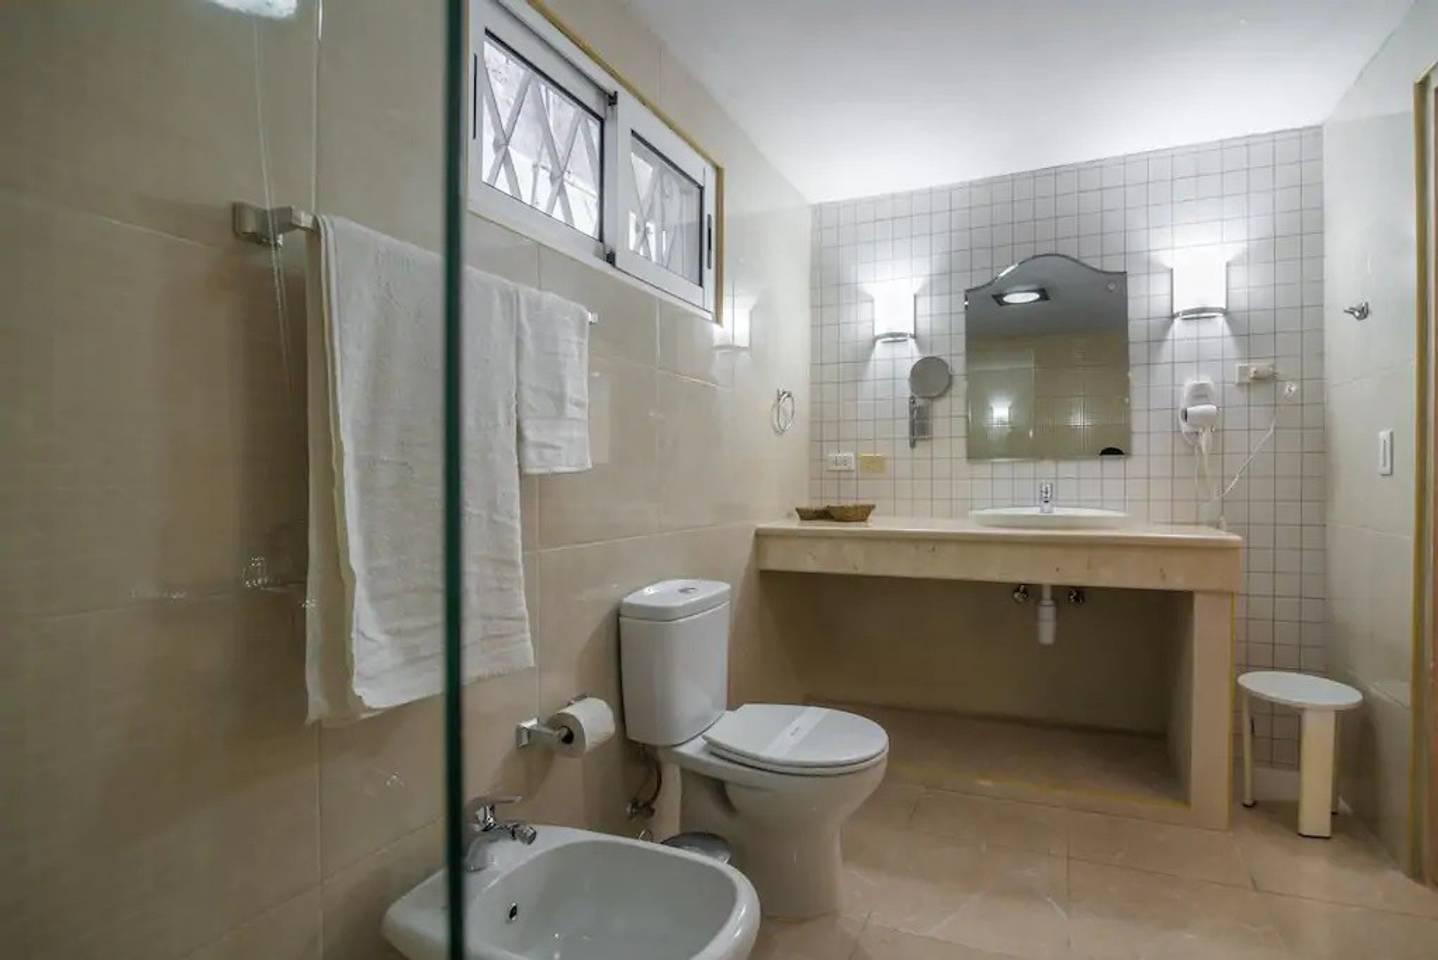 Apartment Villa Don Teto 8 Rooms  Luxury   Great Havana View photo 23332346